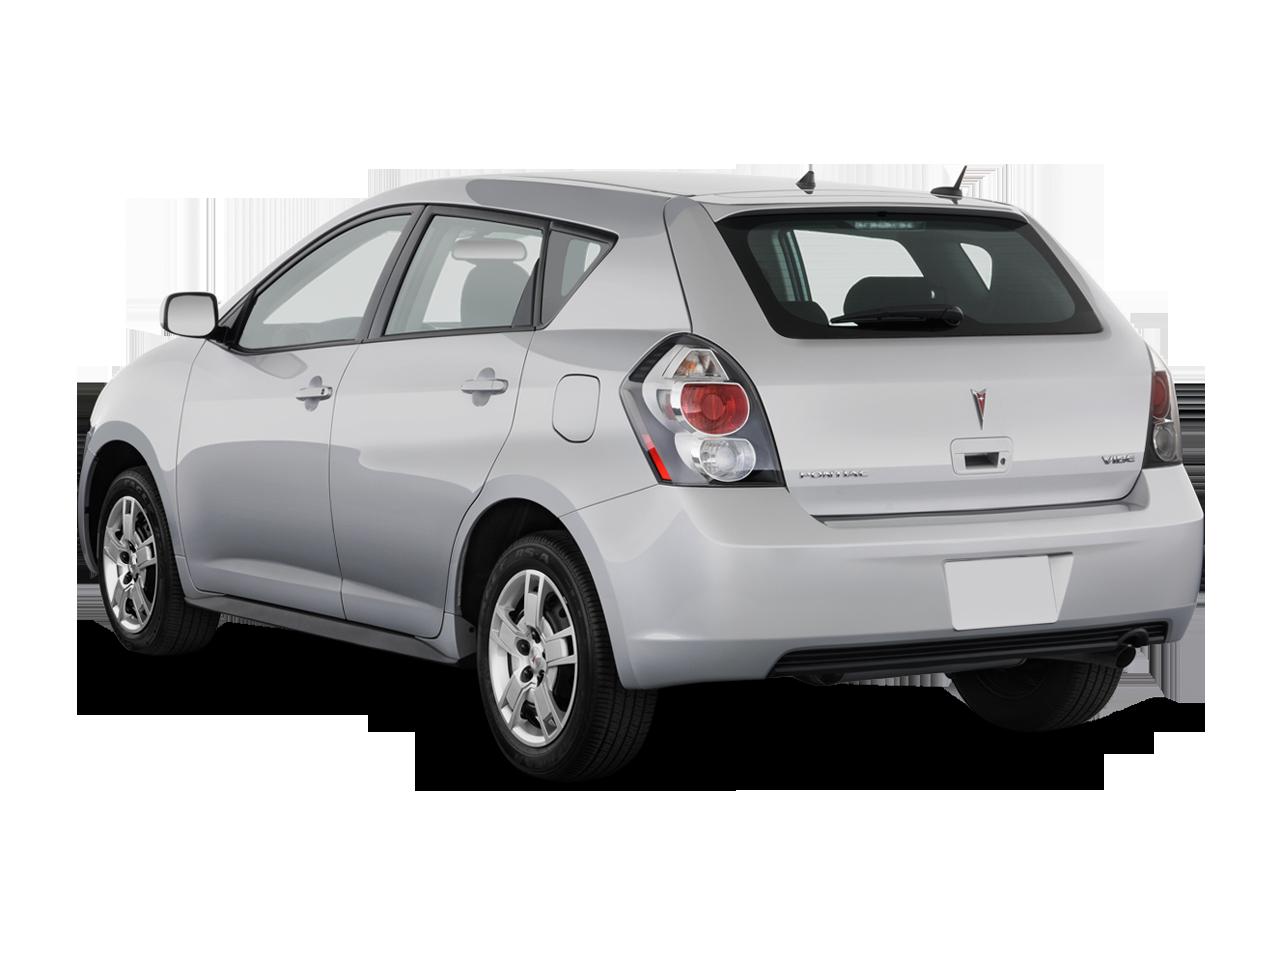 Pontiac Vibe I Restyling 2004 - 2008 Compact MPV #2